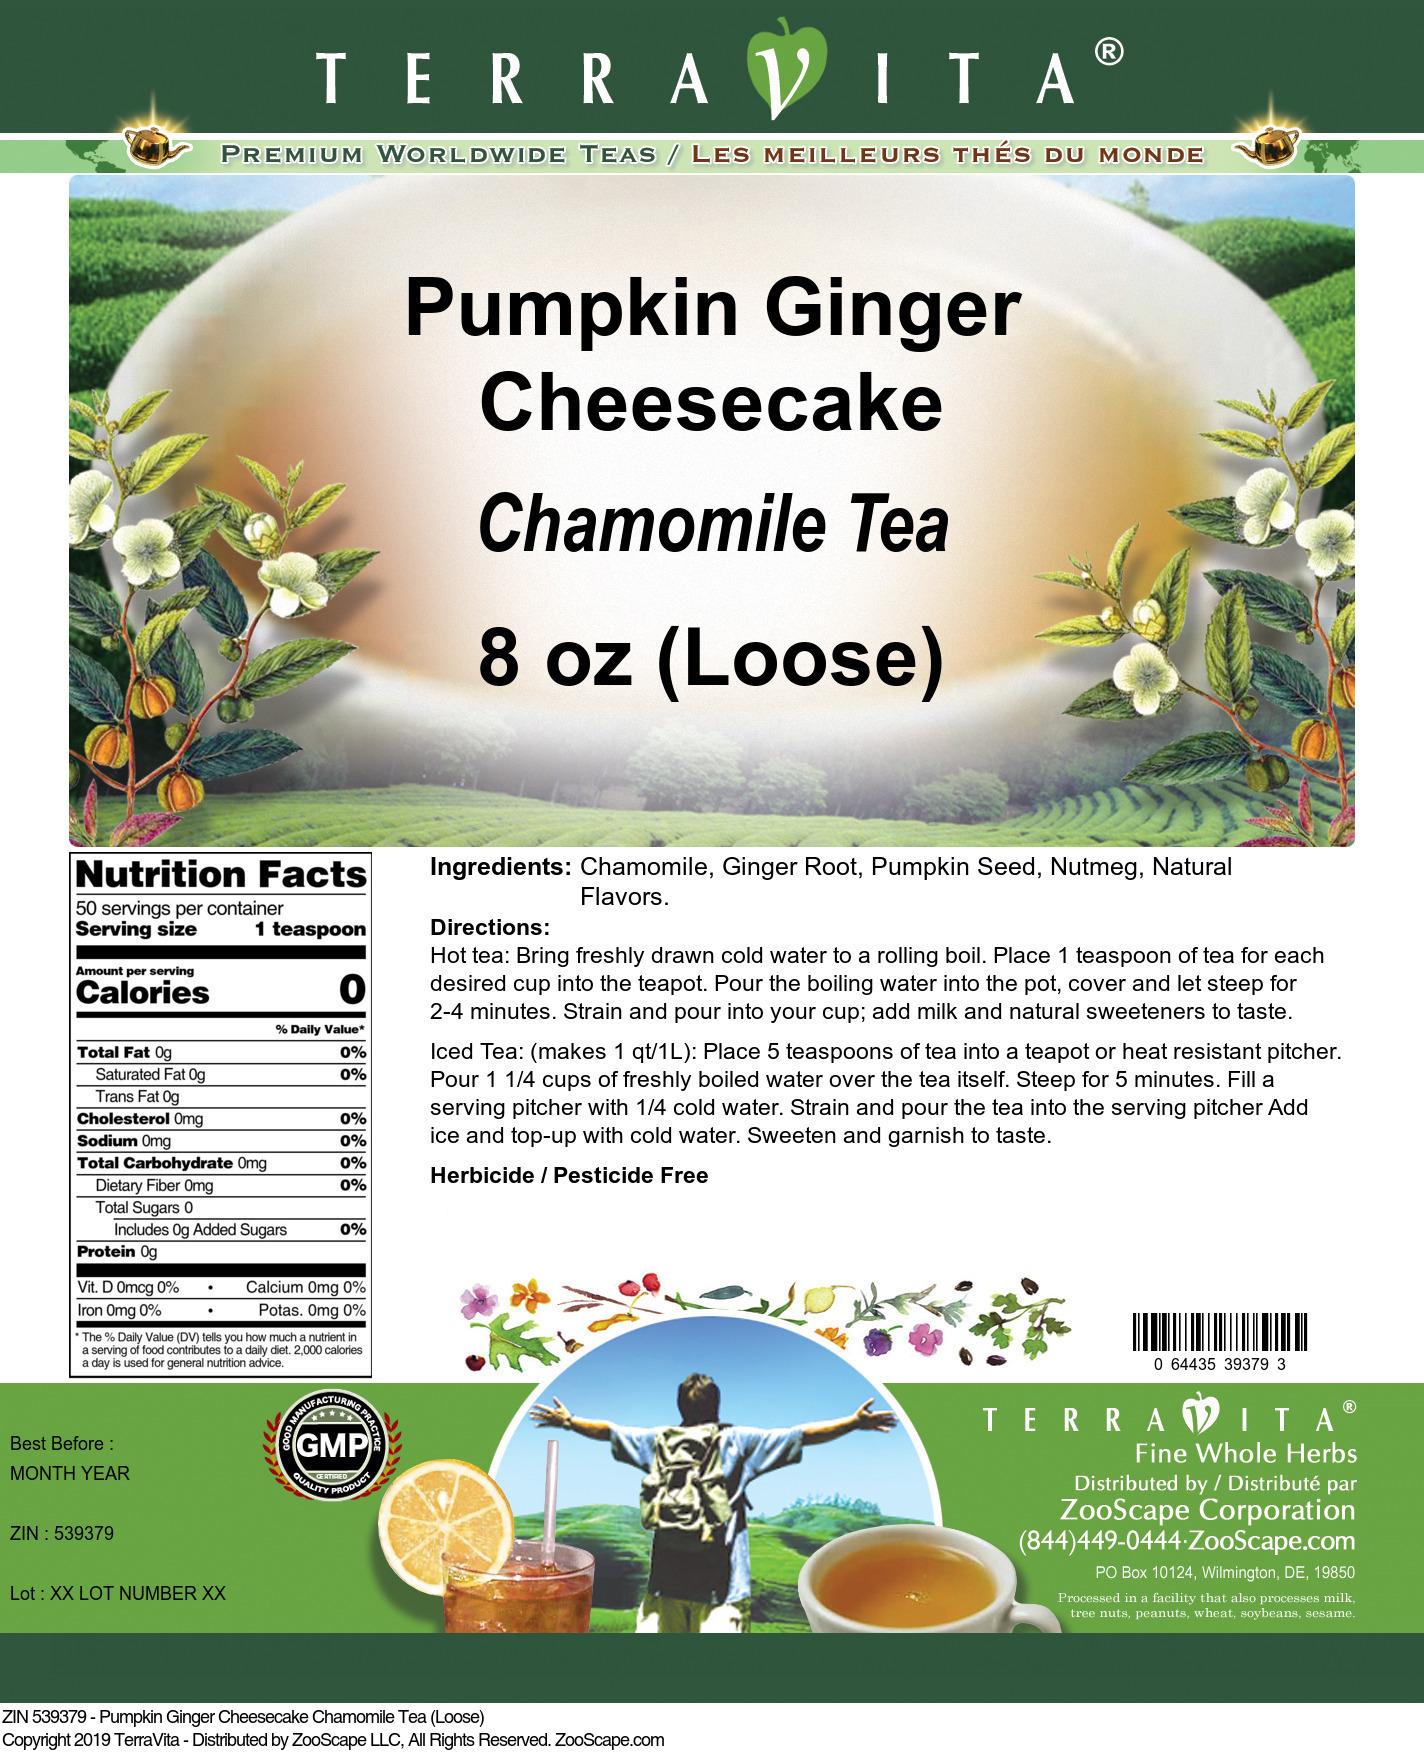 Pumpkin Ginger Cheesecake Chamomile Tea (Loose)